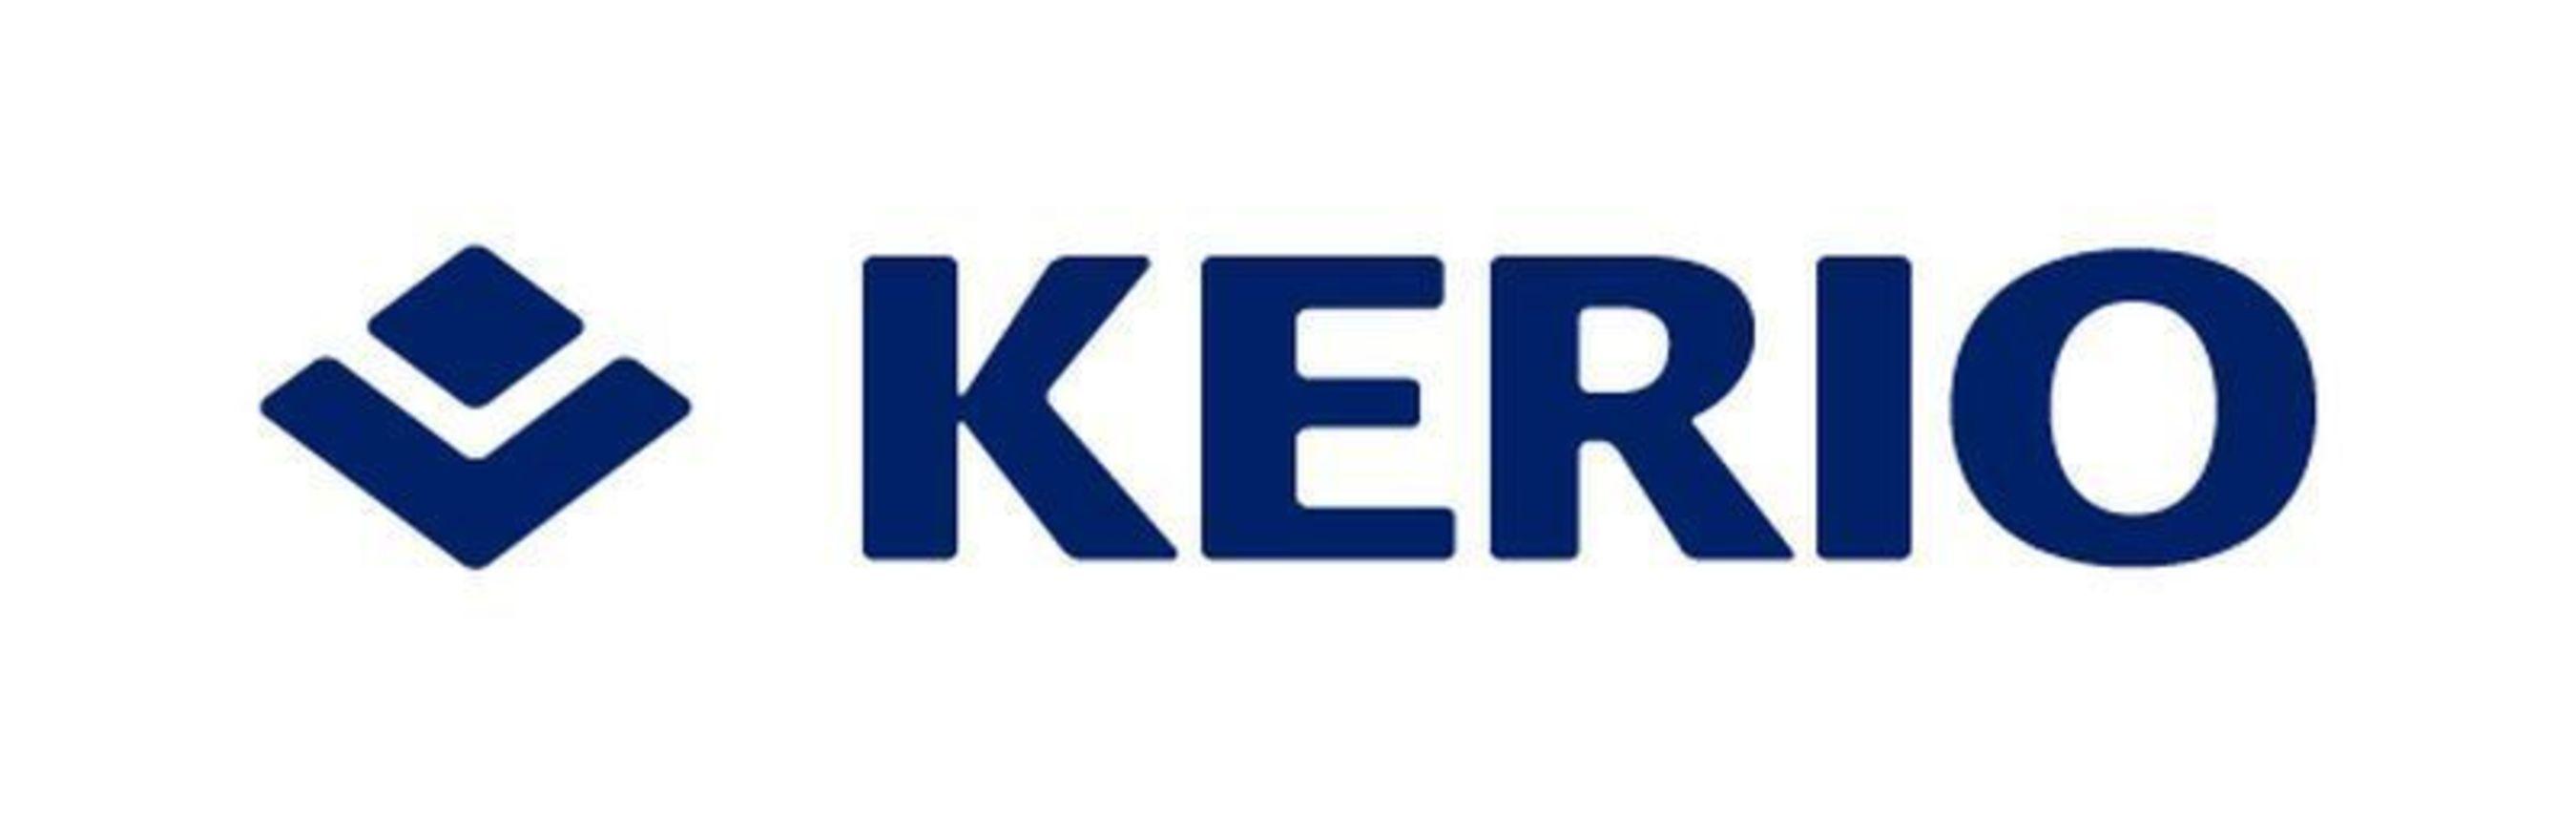 Kerio Technologies. (PRNewsFoto/Kerio Technologies)